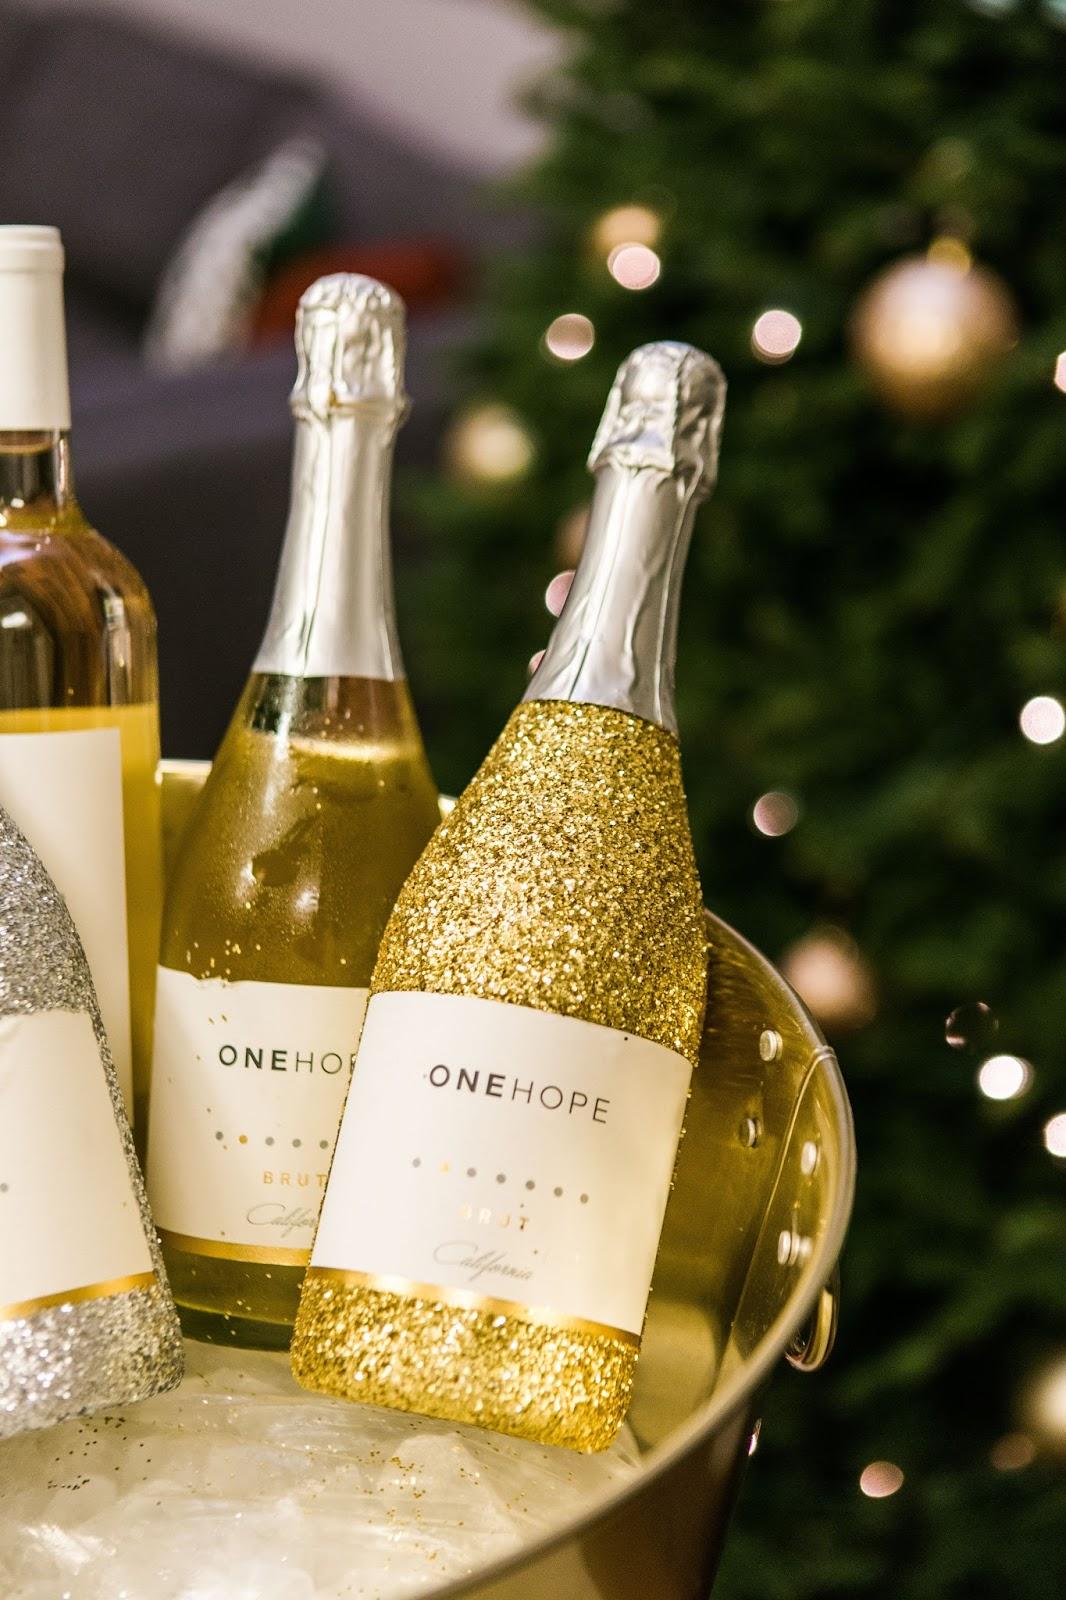 one hope glitter champagne, glitter, nye champagne, pop bottles